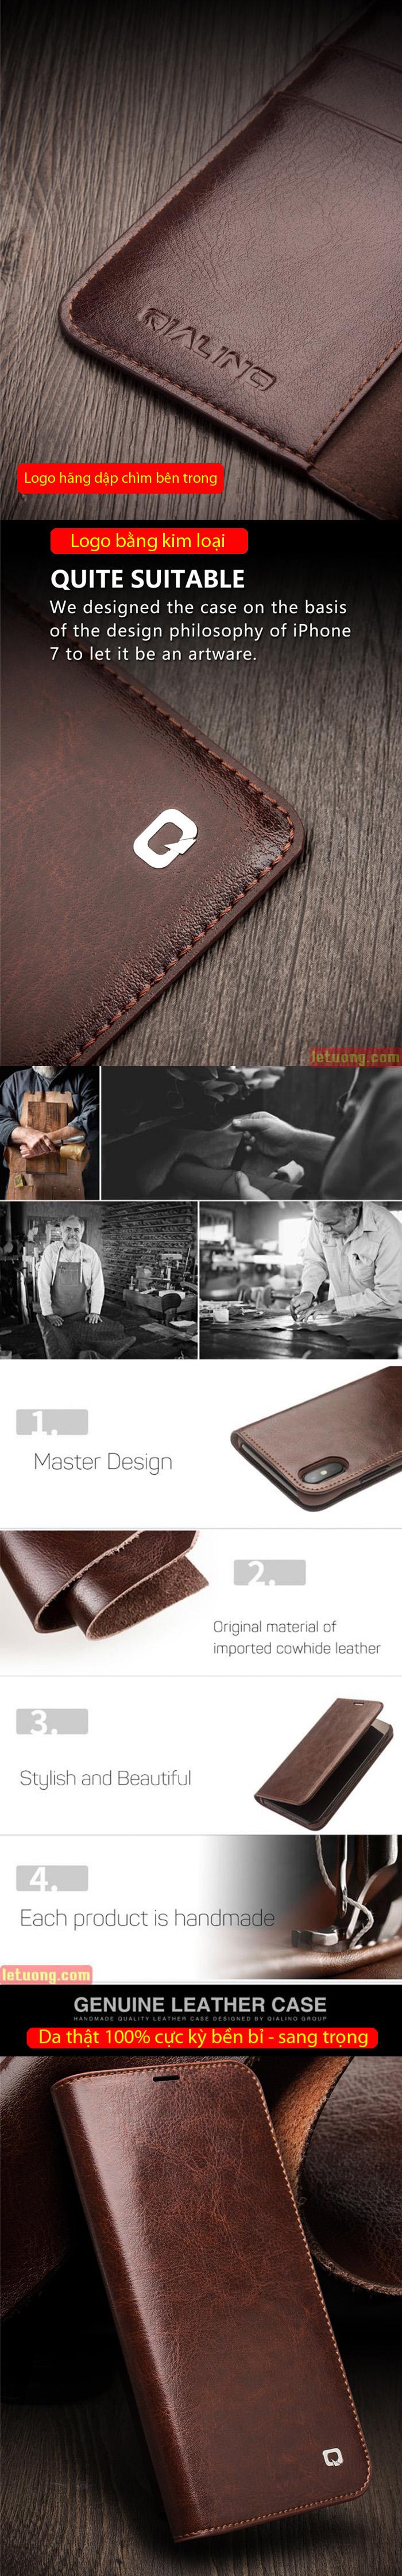 Bao da iPhone 11 Pro Max Qialino Classic Leather Hanmade da thật 7